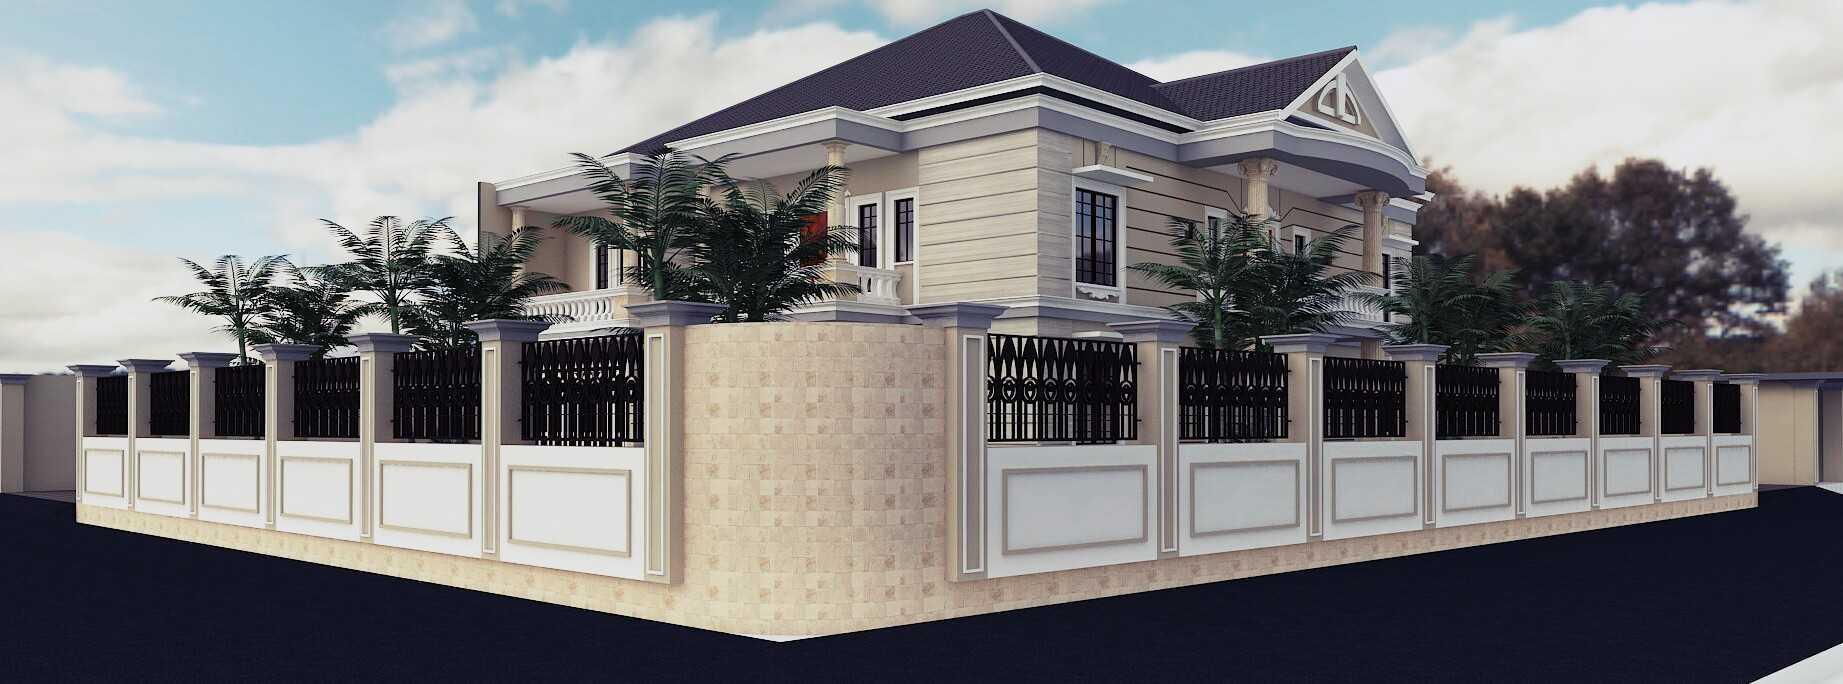 Chai Twin Co Residence Classic Style Jawa Tengah, Indonesia Jawa Tengah, Indonesia Img20170328002100   36473